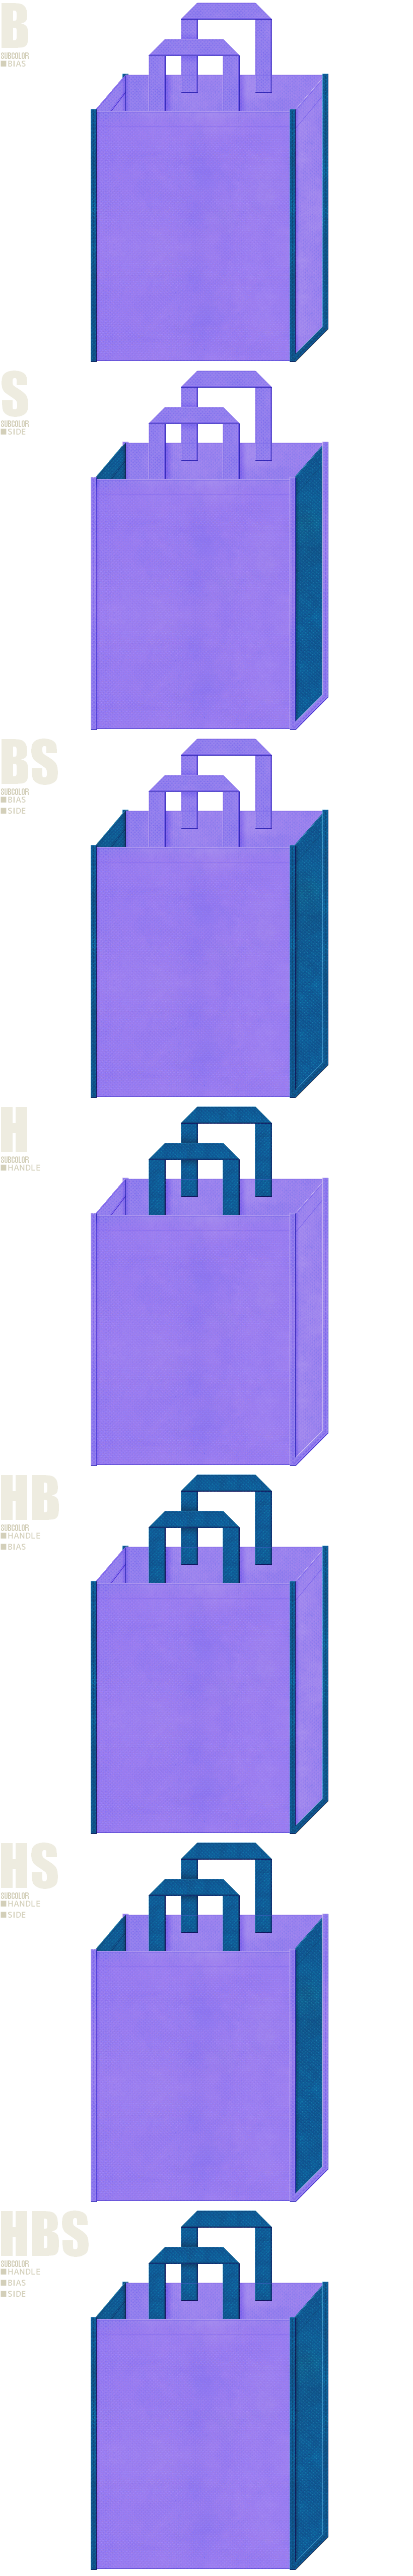 DHA・LED・人工知能・セキュリティの展示会用バッグにお奨めの不織布バッグのデザイン:薄紫色と青色の配色7パターン